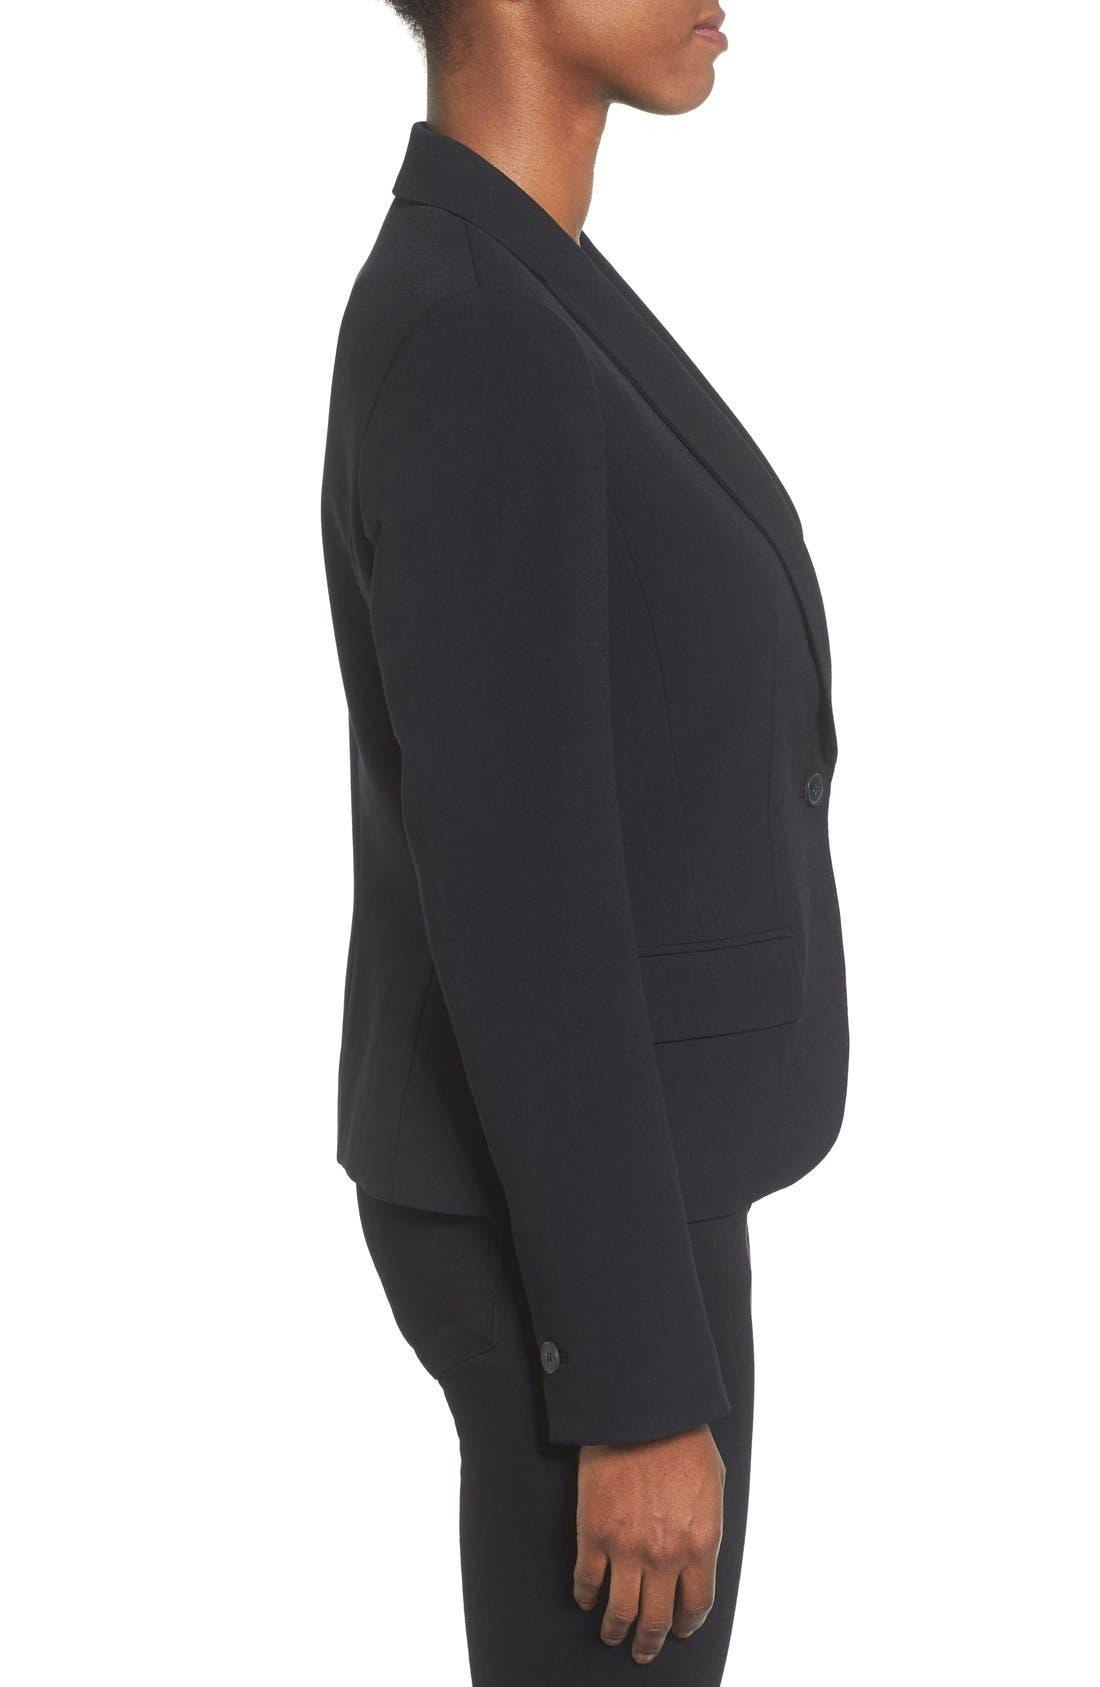 ANNE KLEIN, One-Button Suit Jacket, Alternate thumbnail 3, color, ANNE KLEIN BLACK